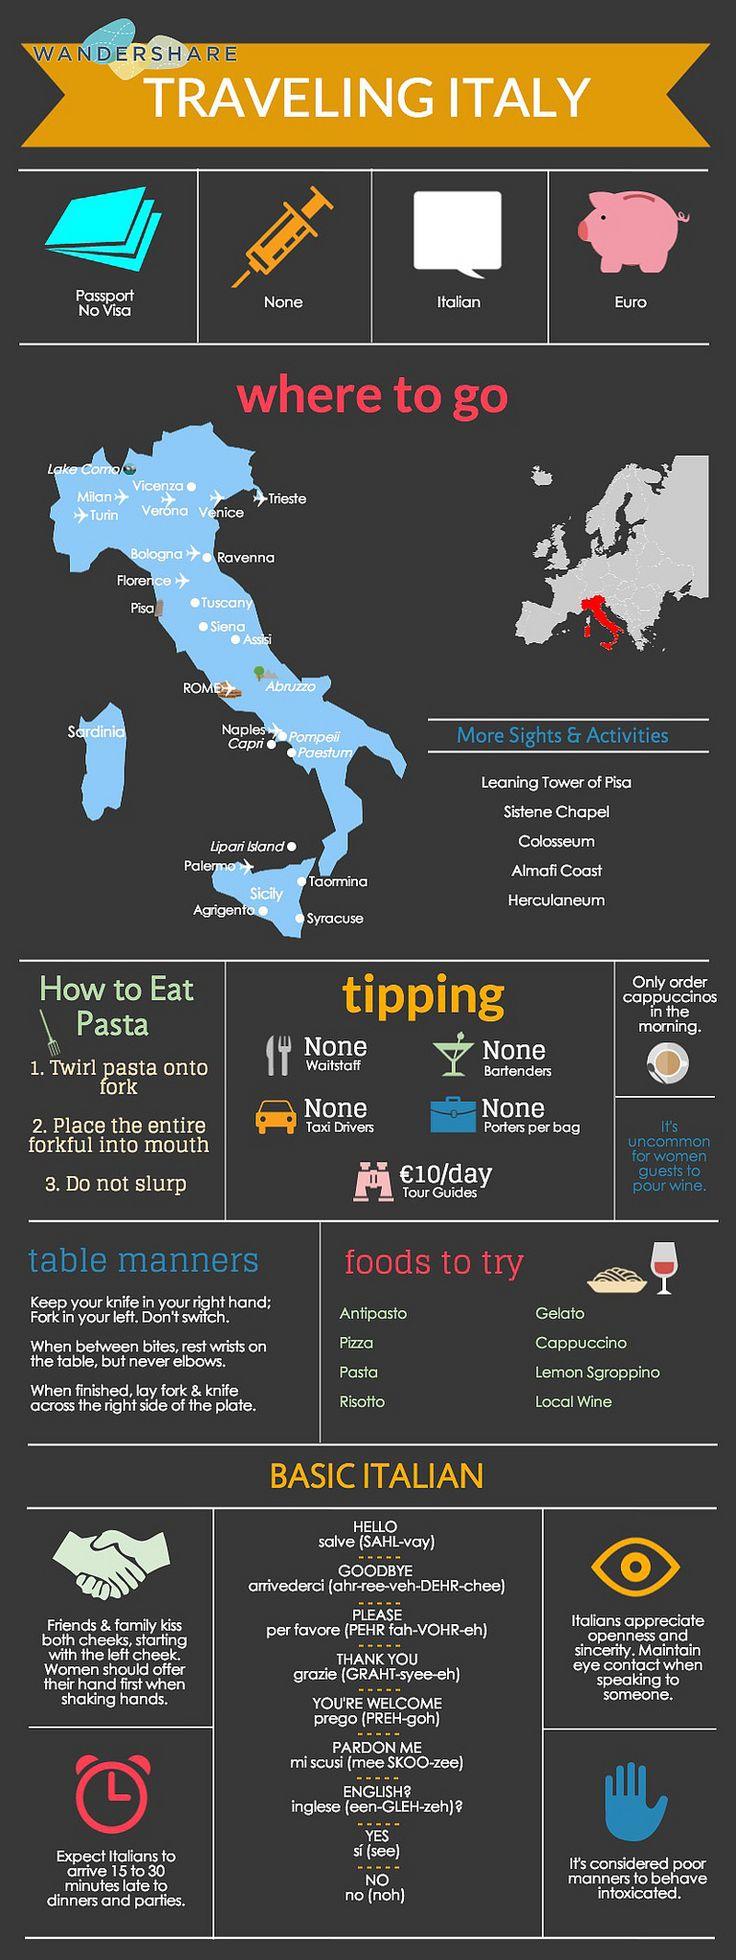 Wandershare.com - Traveling Italy | Flickr - Photo Sharing!